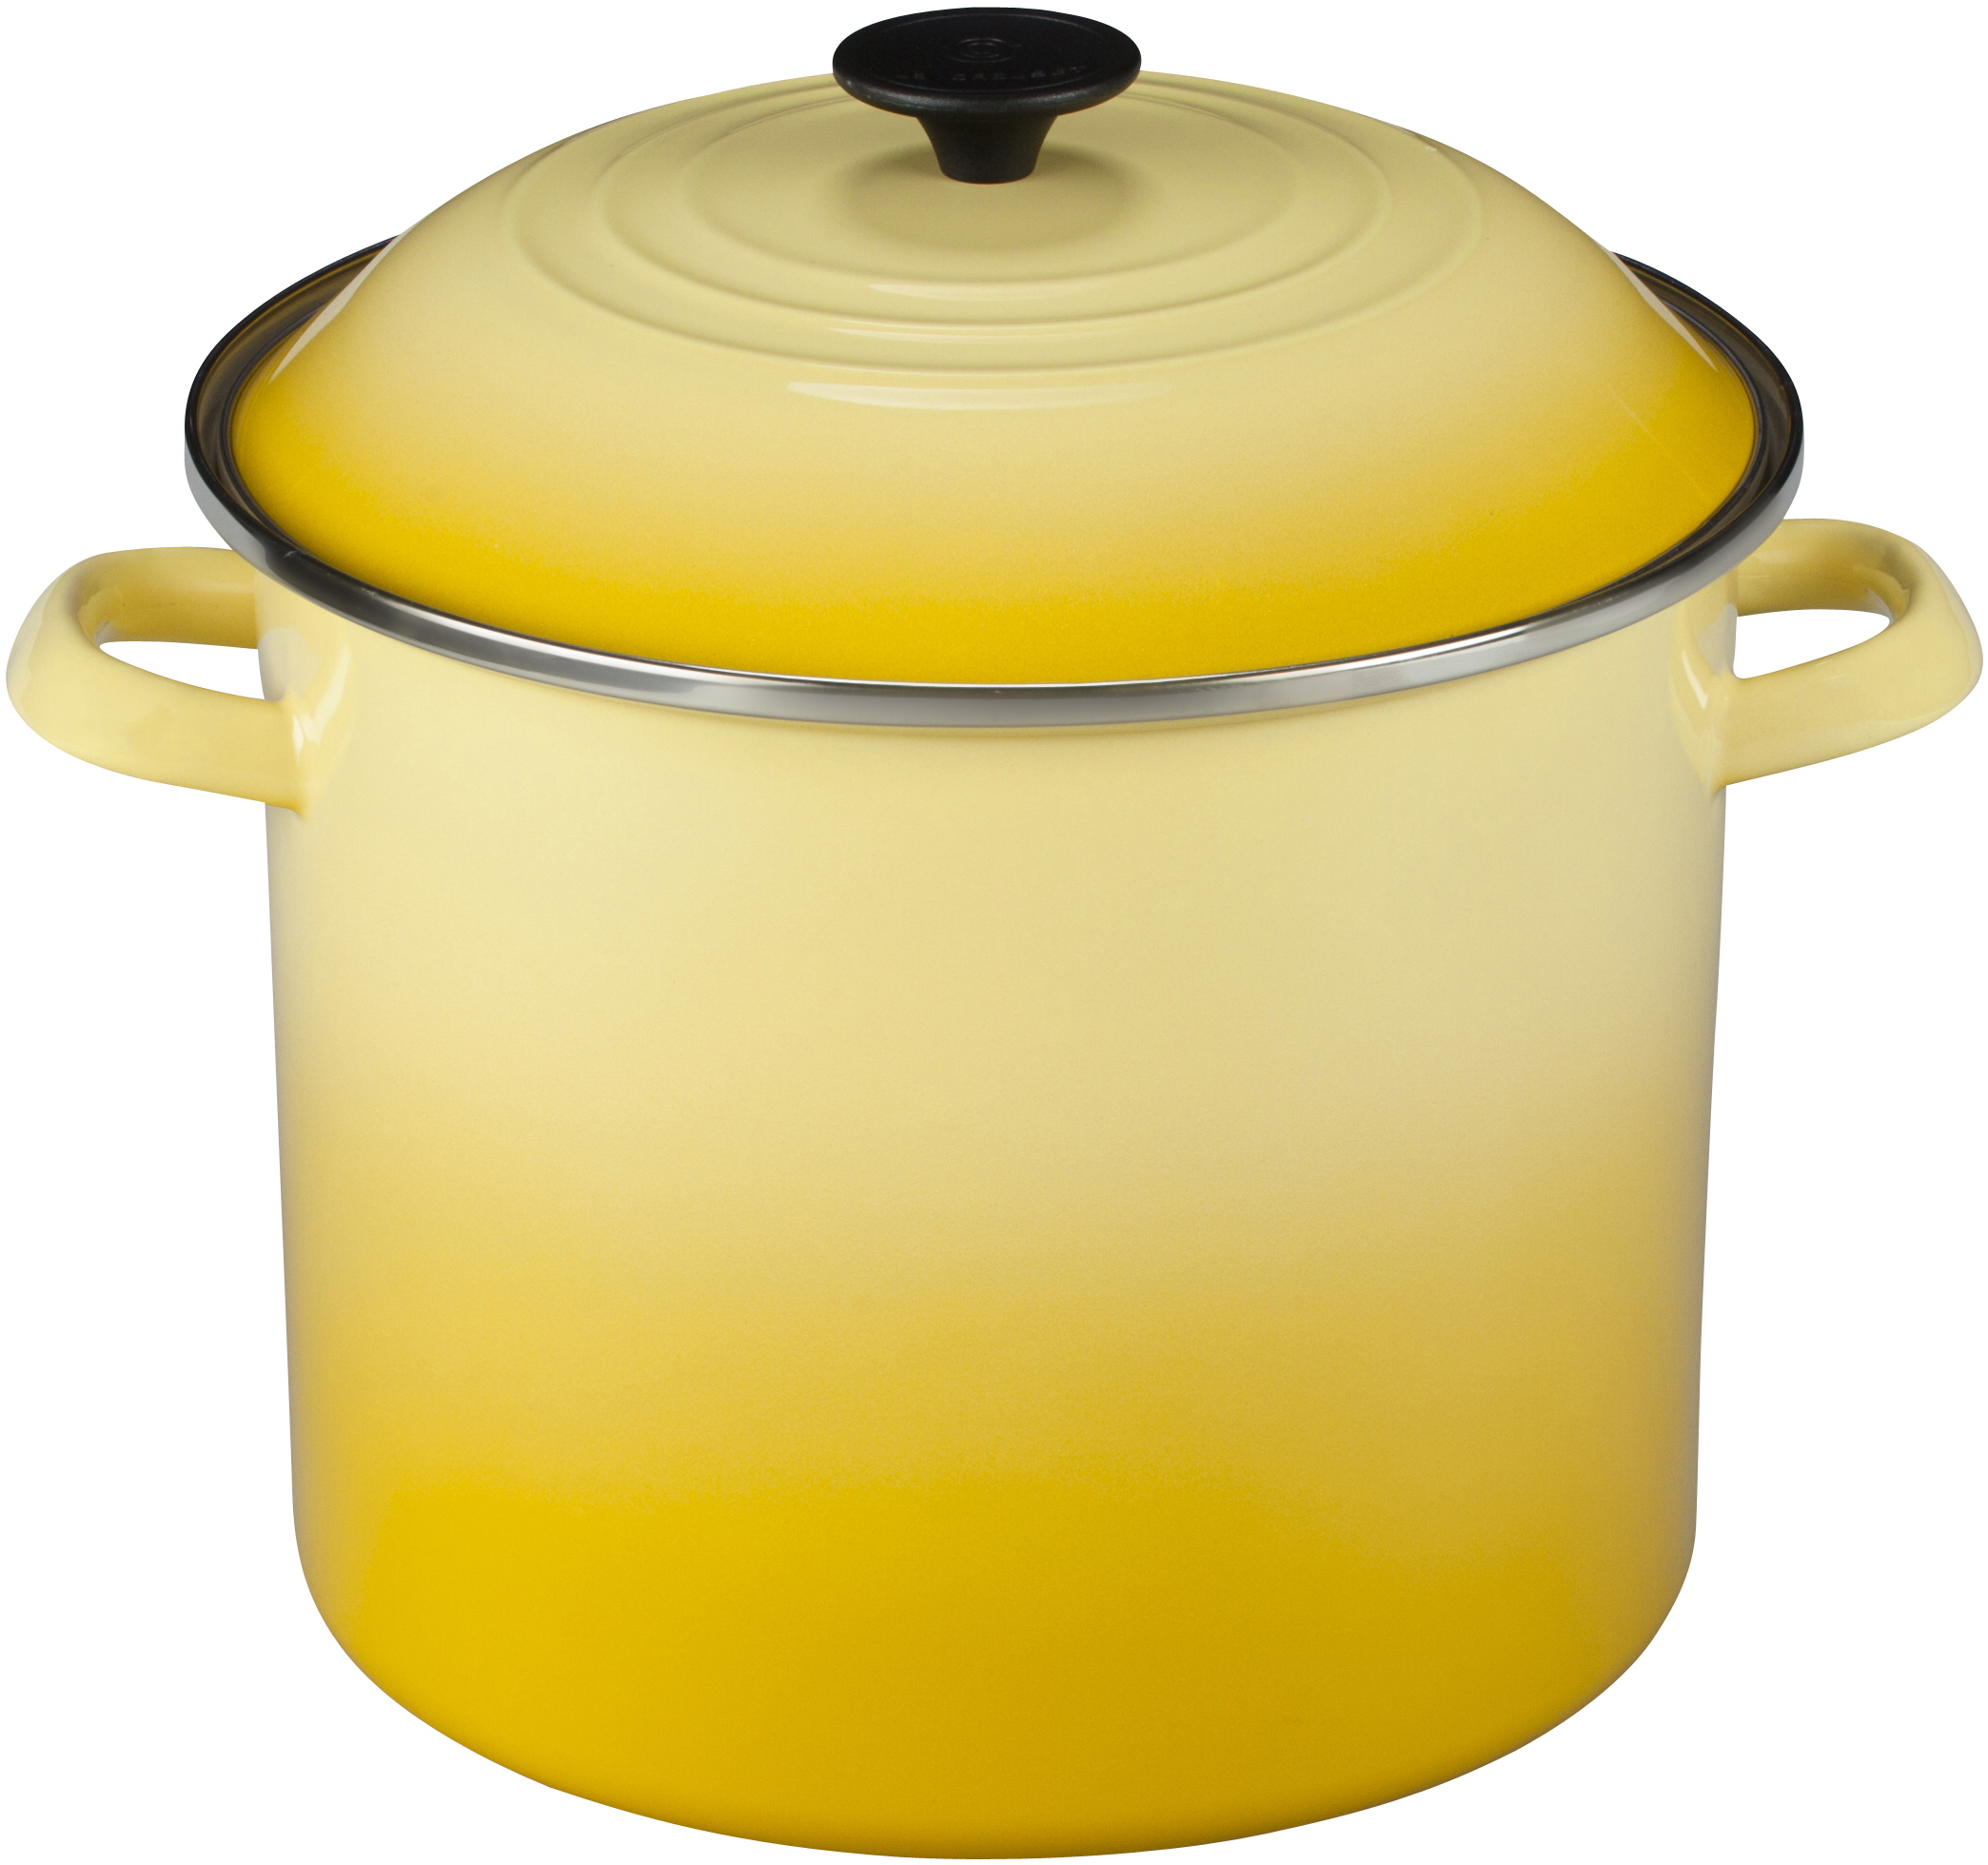 Le Creuset Soleil Yellow Enamel on Steel Stockpot, 16 Quart